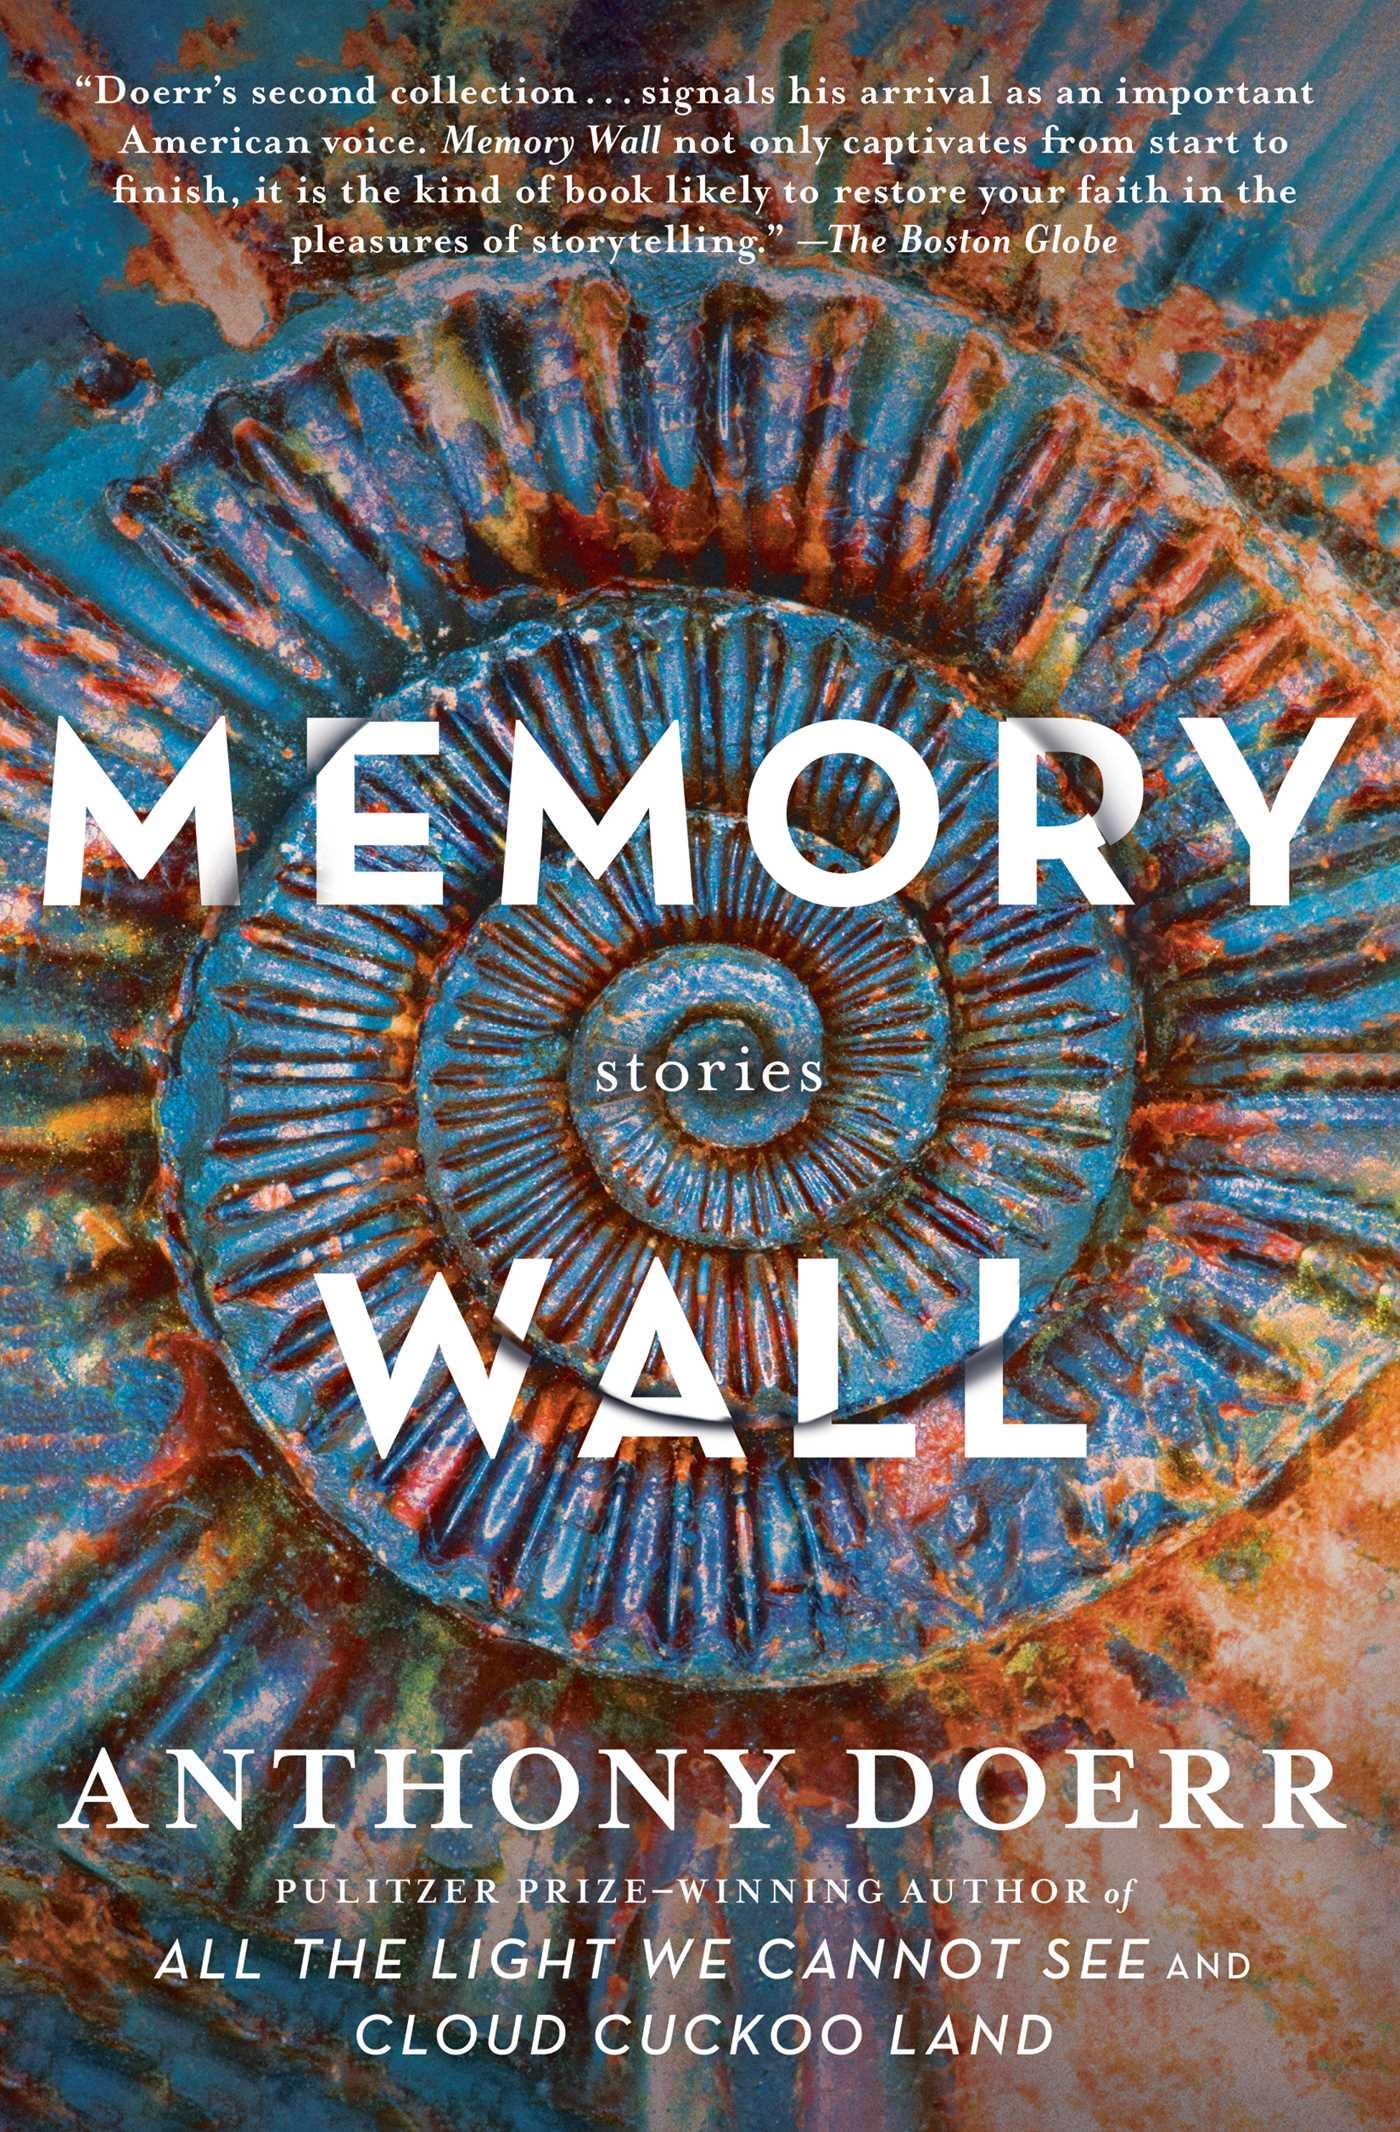 Memory wall 9781439182840 hr